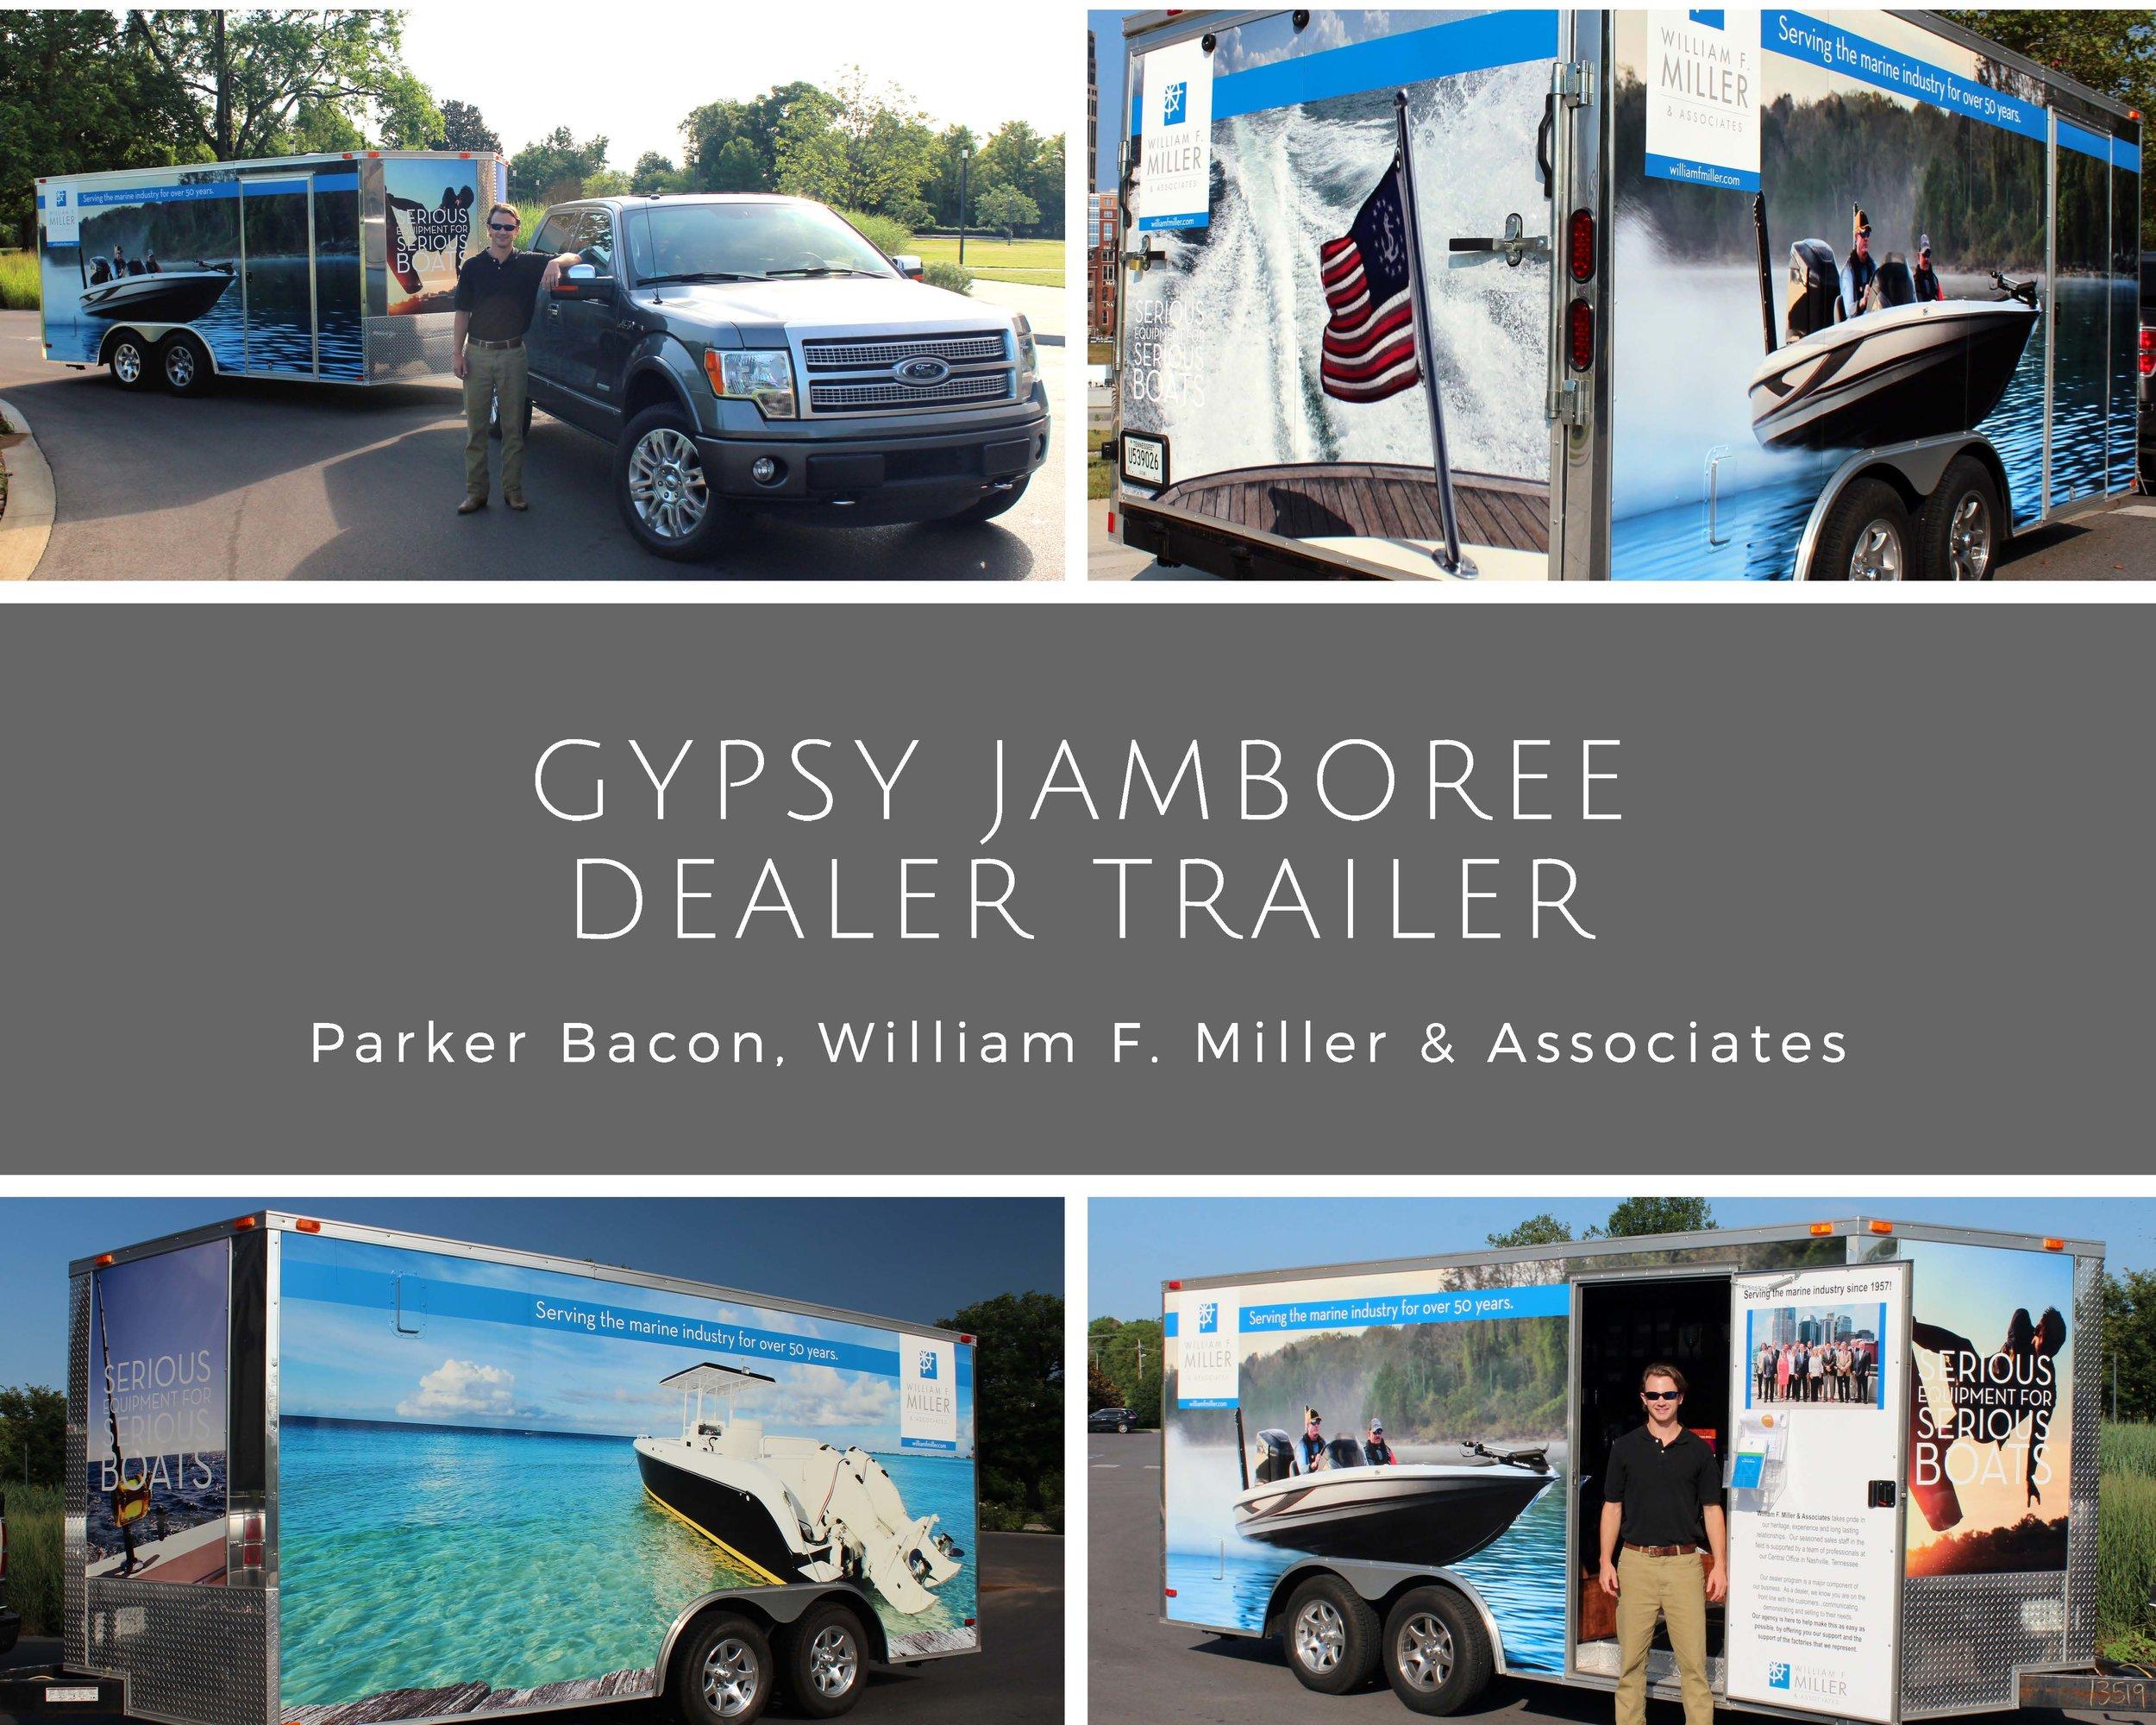 Copy of Copy of Parker Bacon, William F. Miller & Associates.jpg